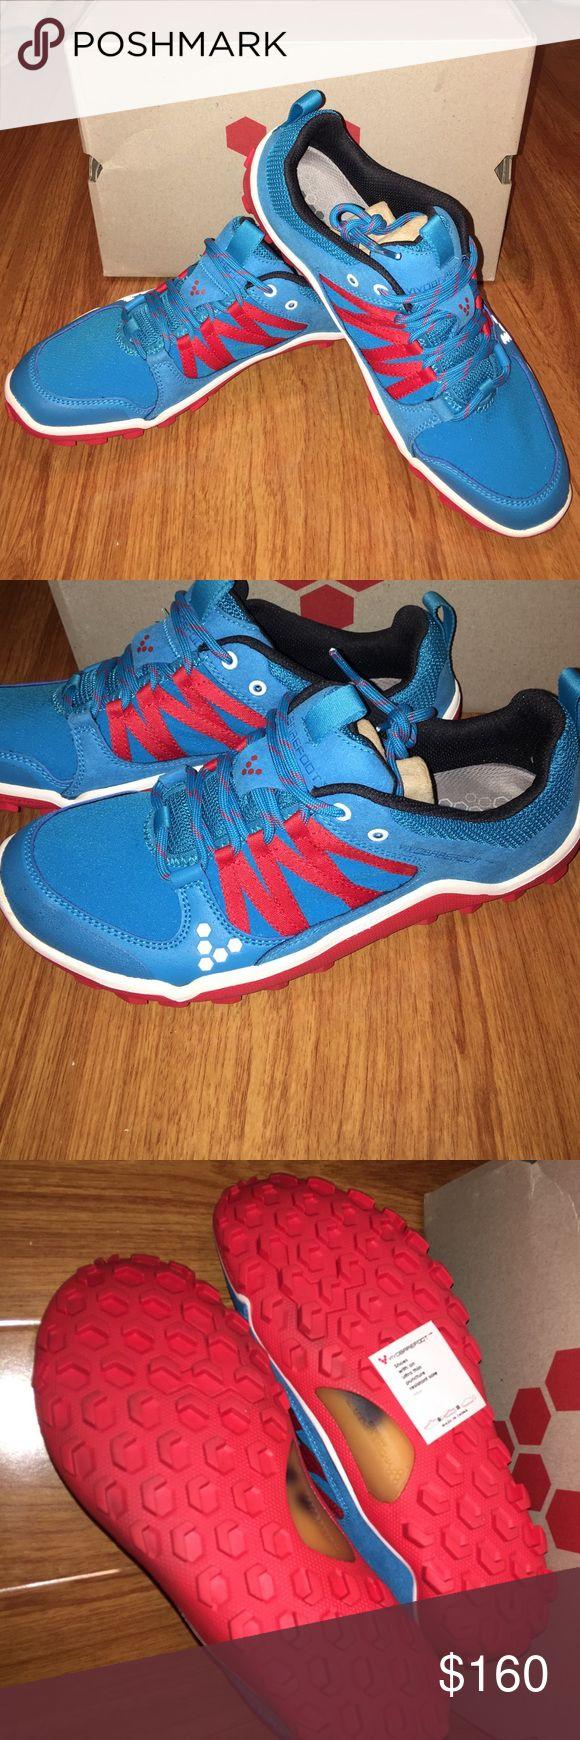 Brand new in box Vivobarefoot shoe Neo trail m blue/red hydrophobic mesh. 41 eu size Vivo barefoot Shoes Sneakers